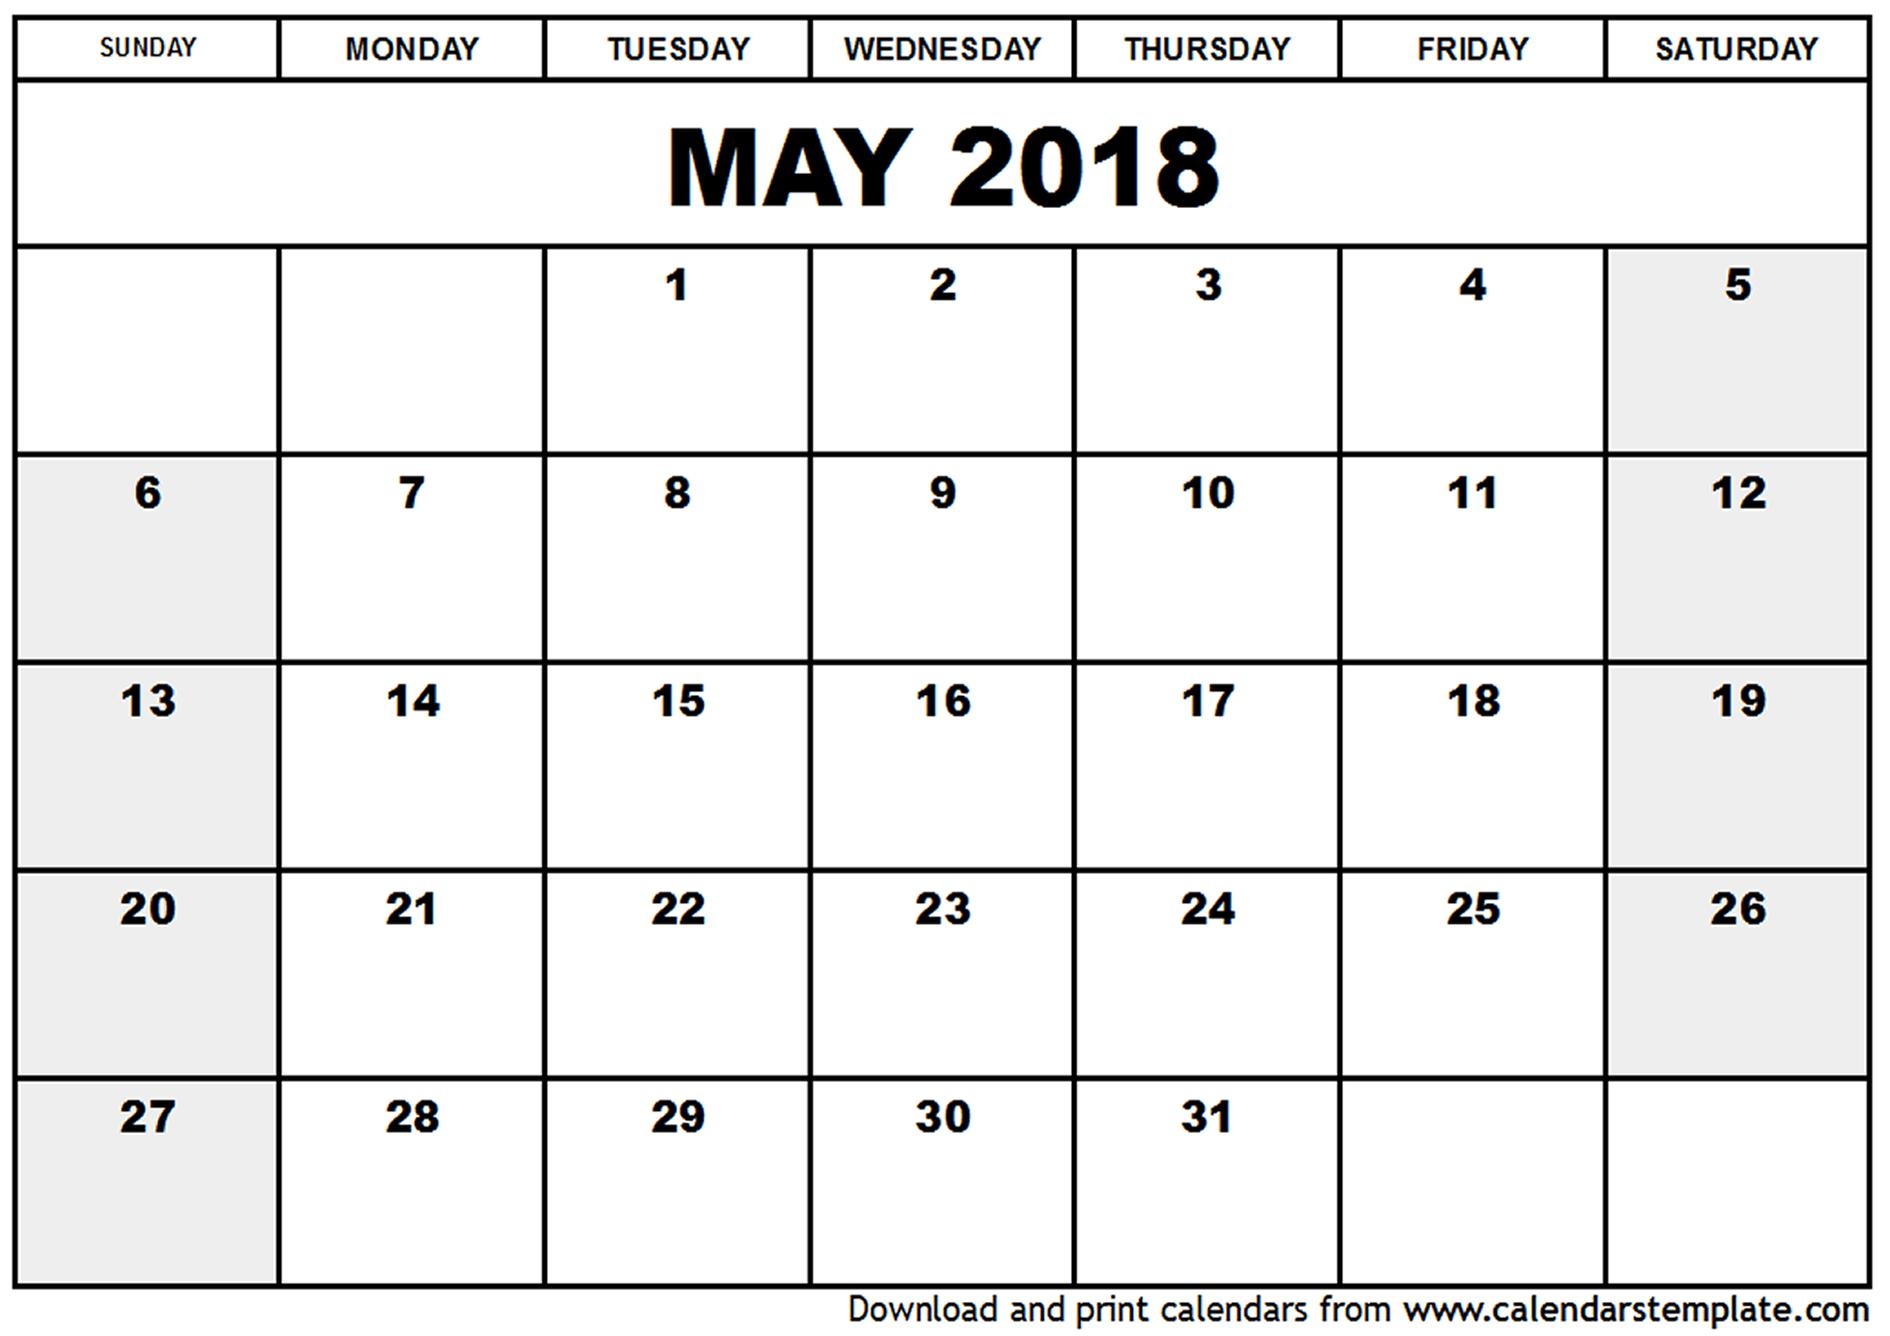 May 2018 Calendar Excel